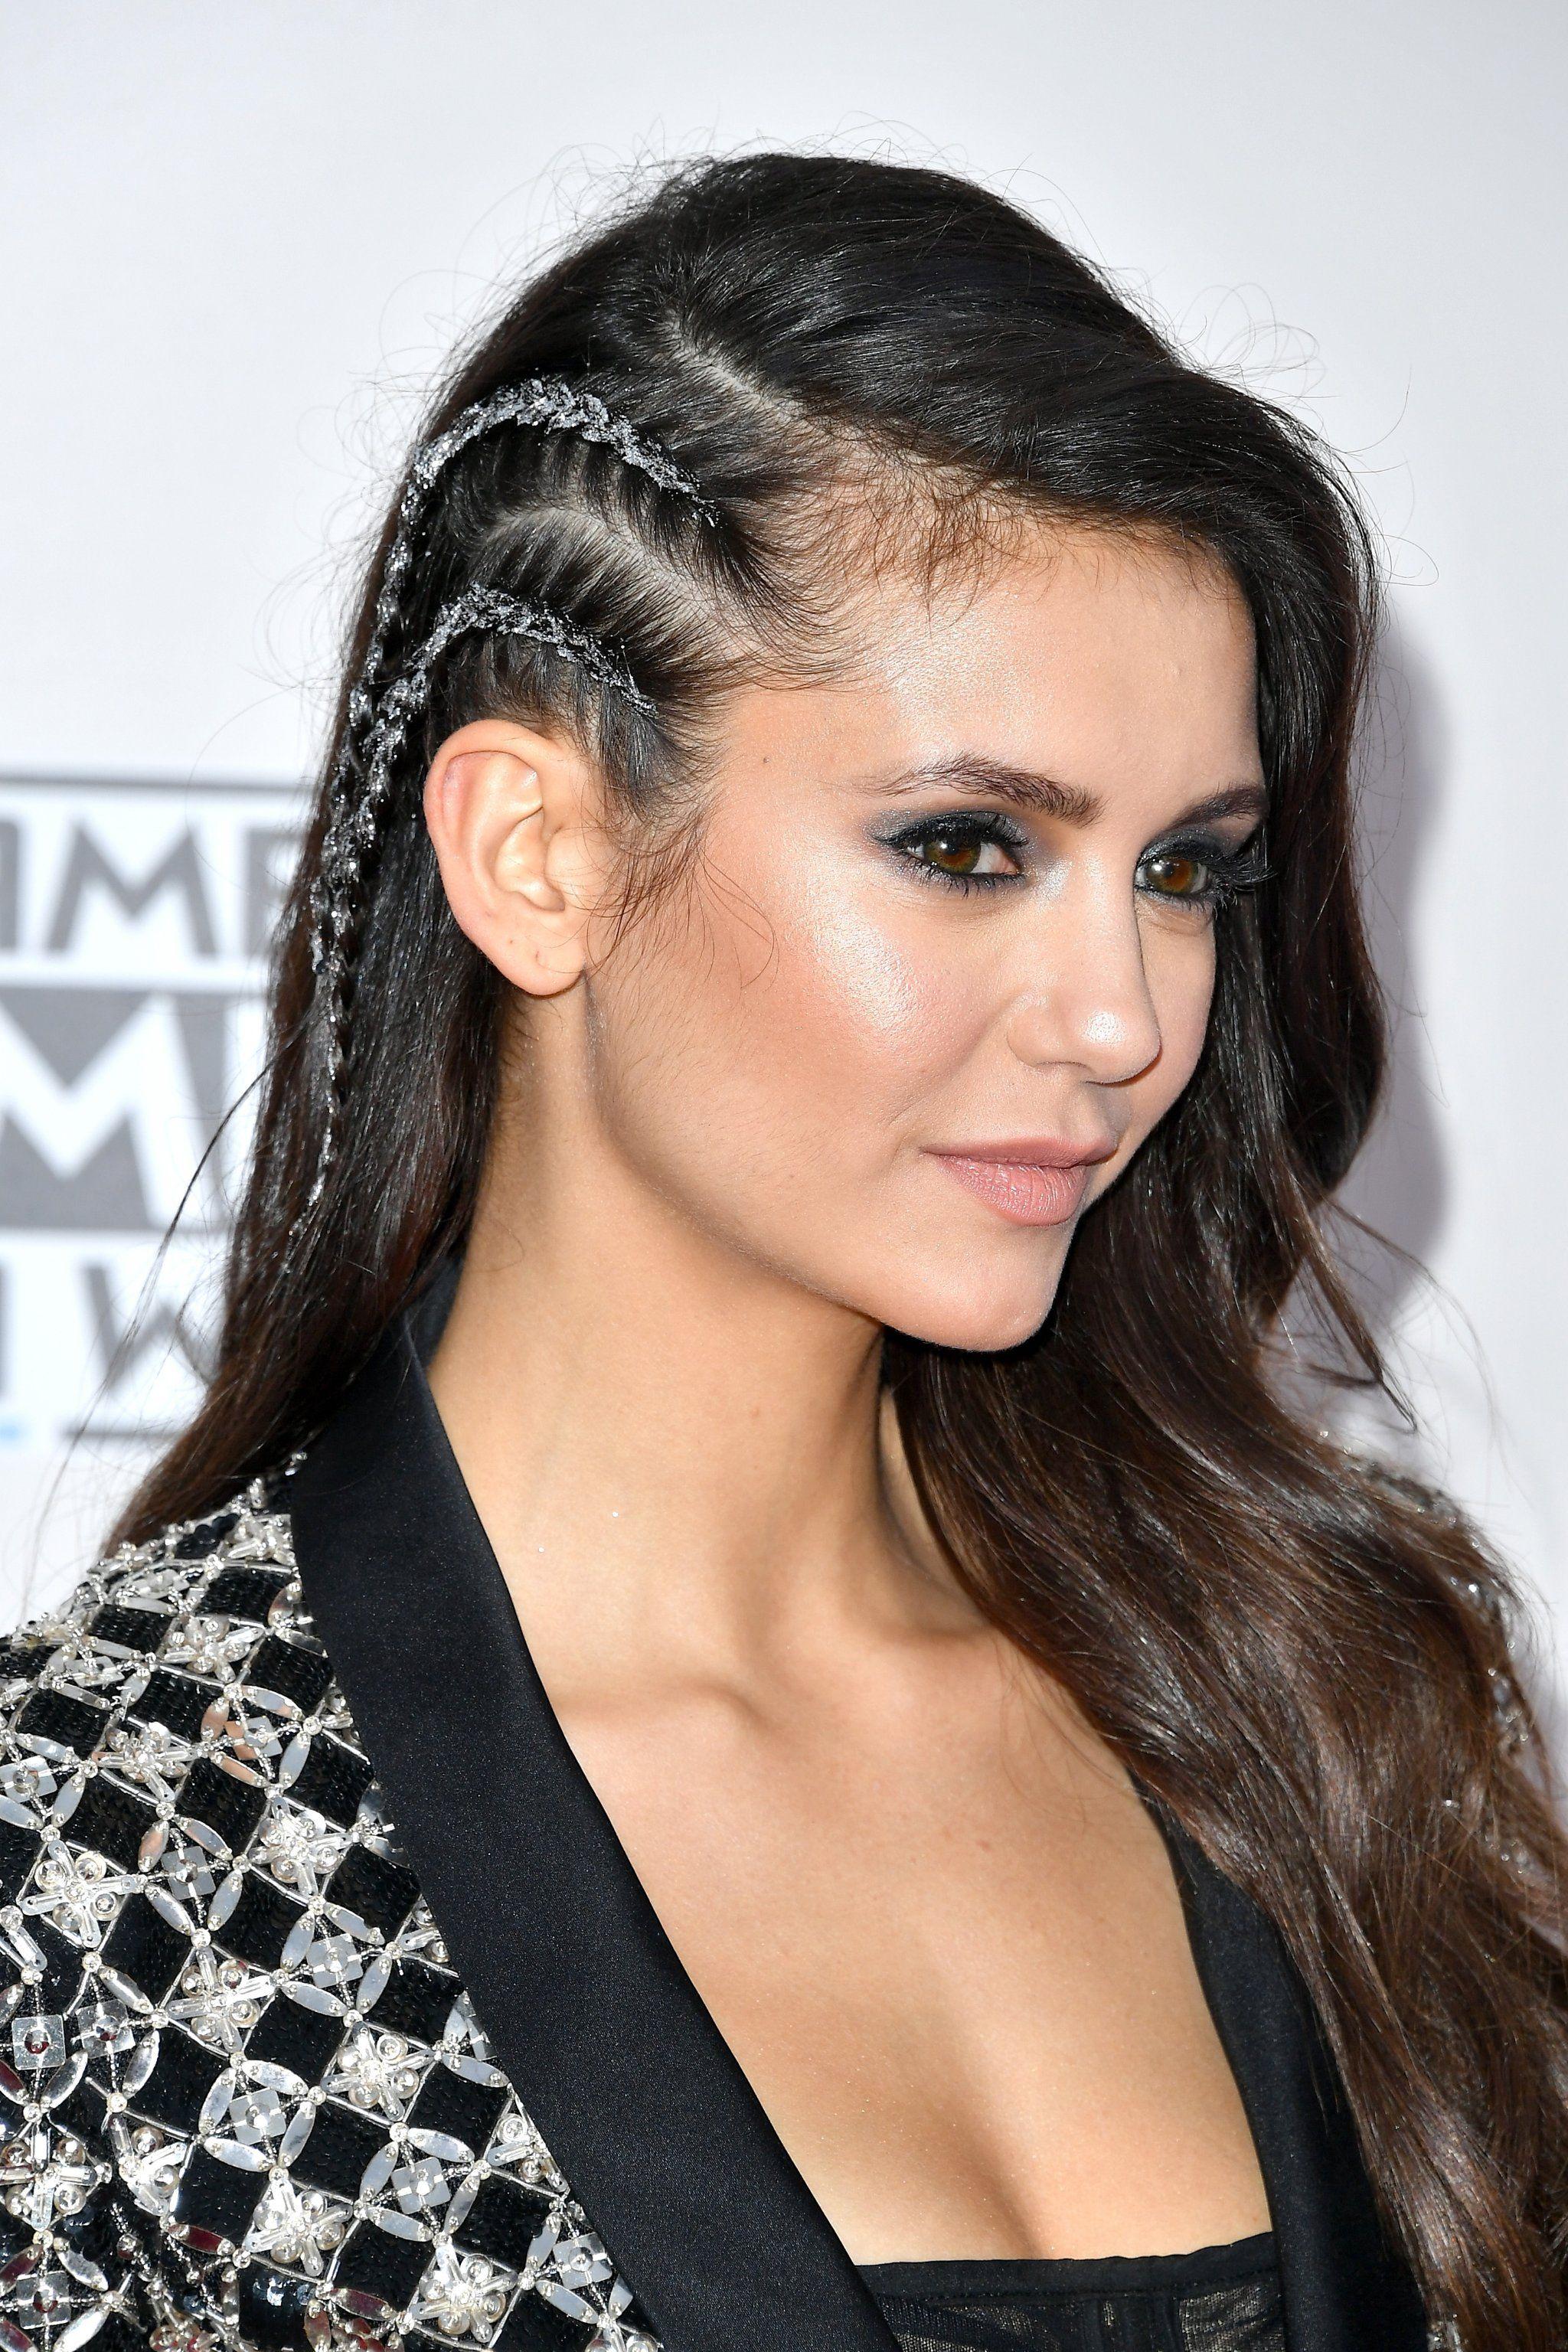 Nina Dobrev Just Made Glitter Undercut Braids Happen at the AMAs